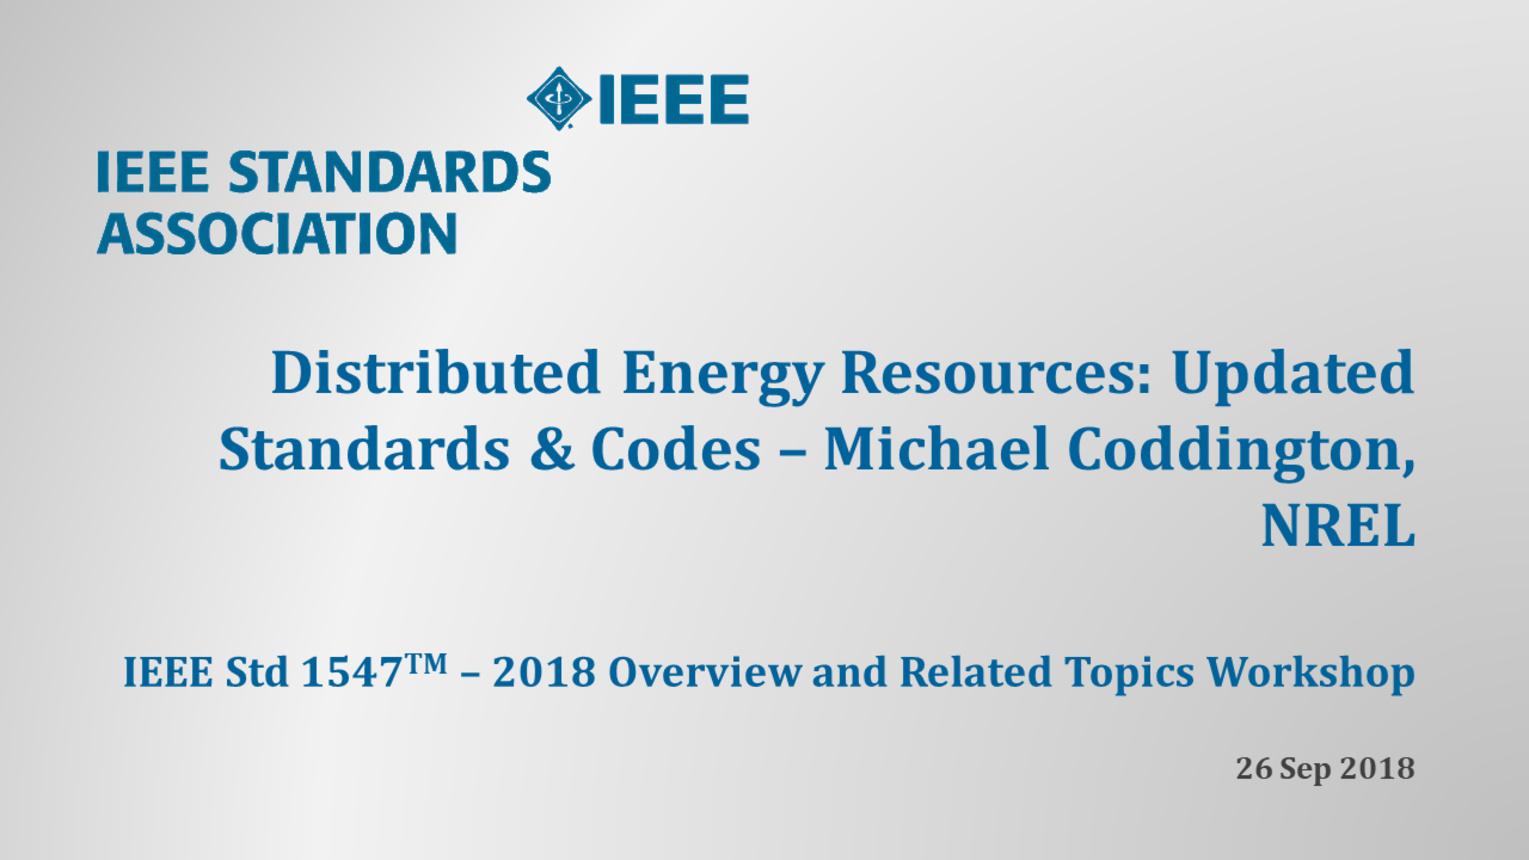 IEEE Std 1547 Workshop - NERC - Atlanta, GA - Sept. 2018: Updated Standards and Codes - Michael Coddington